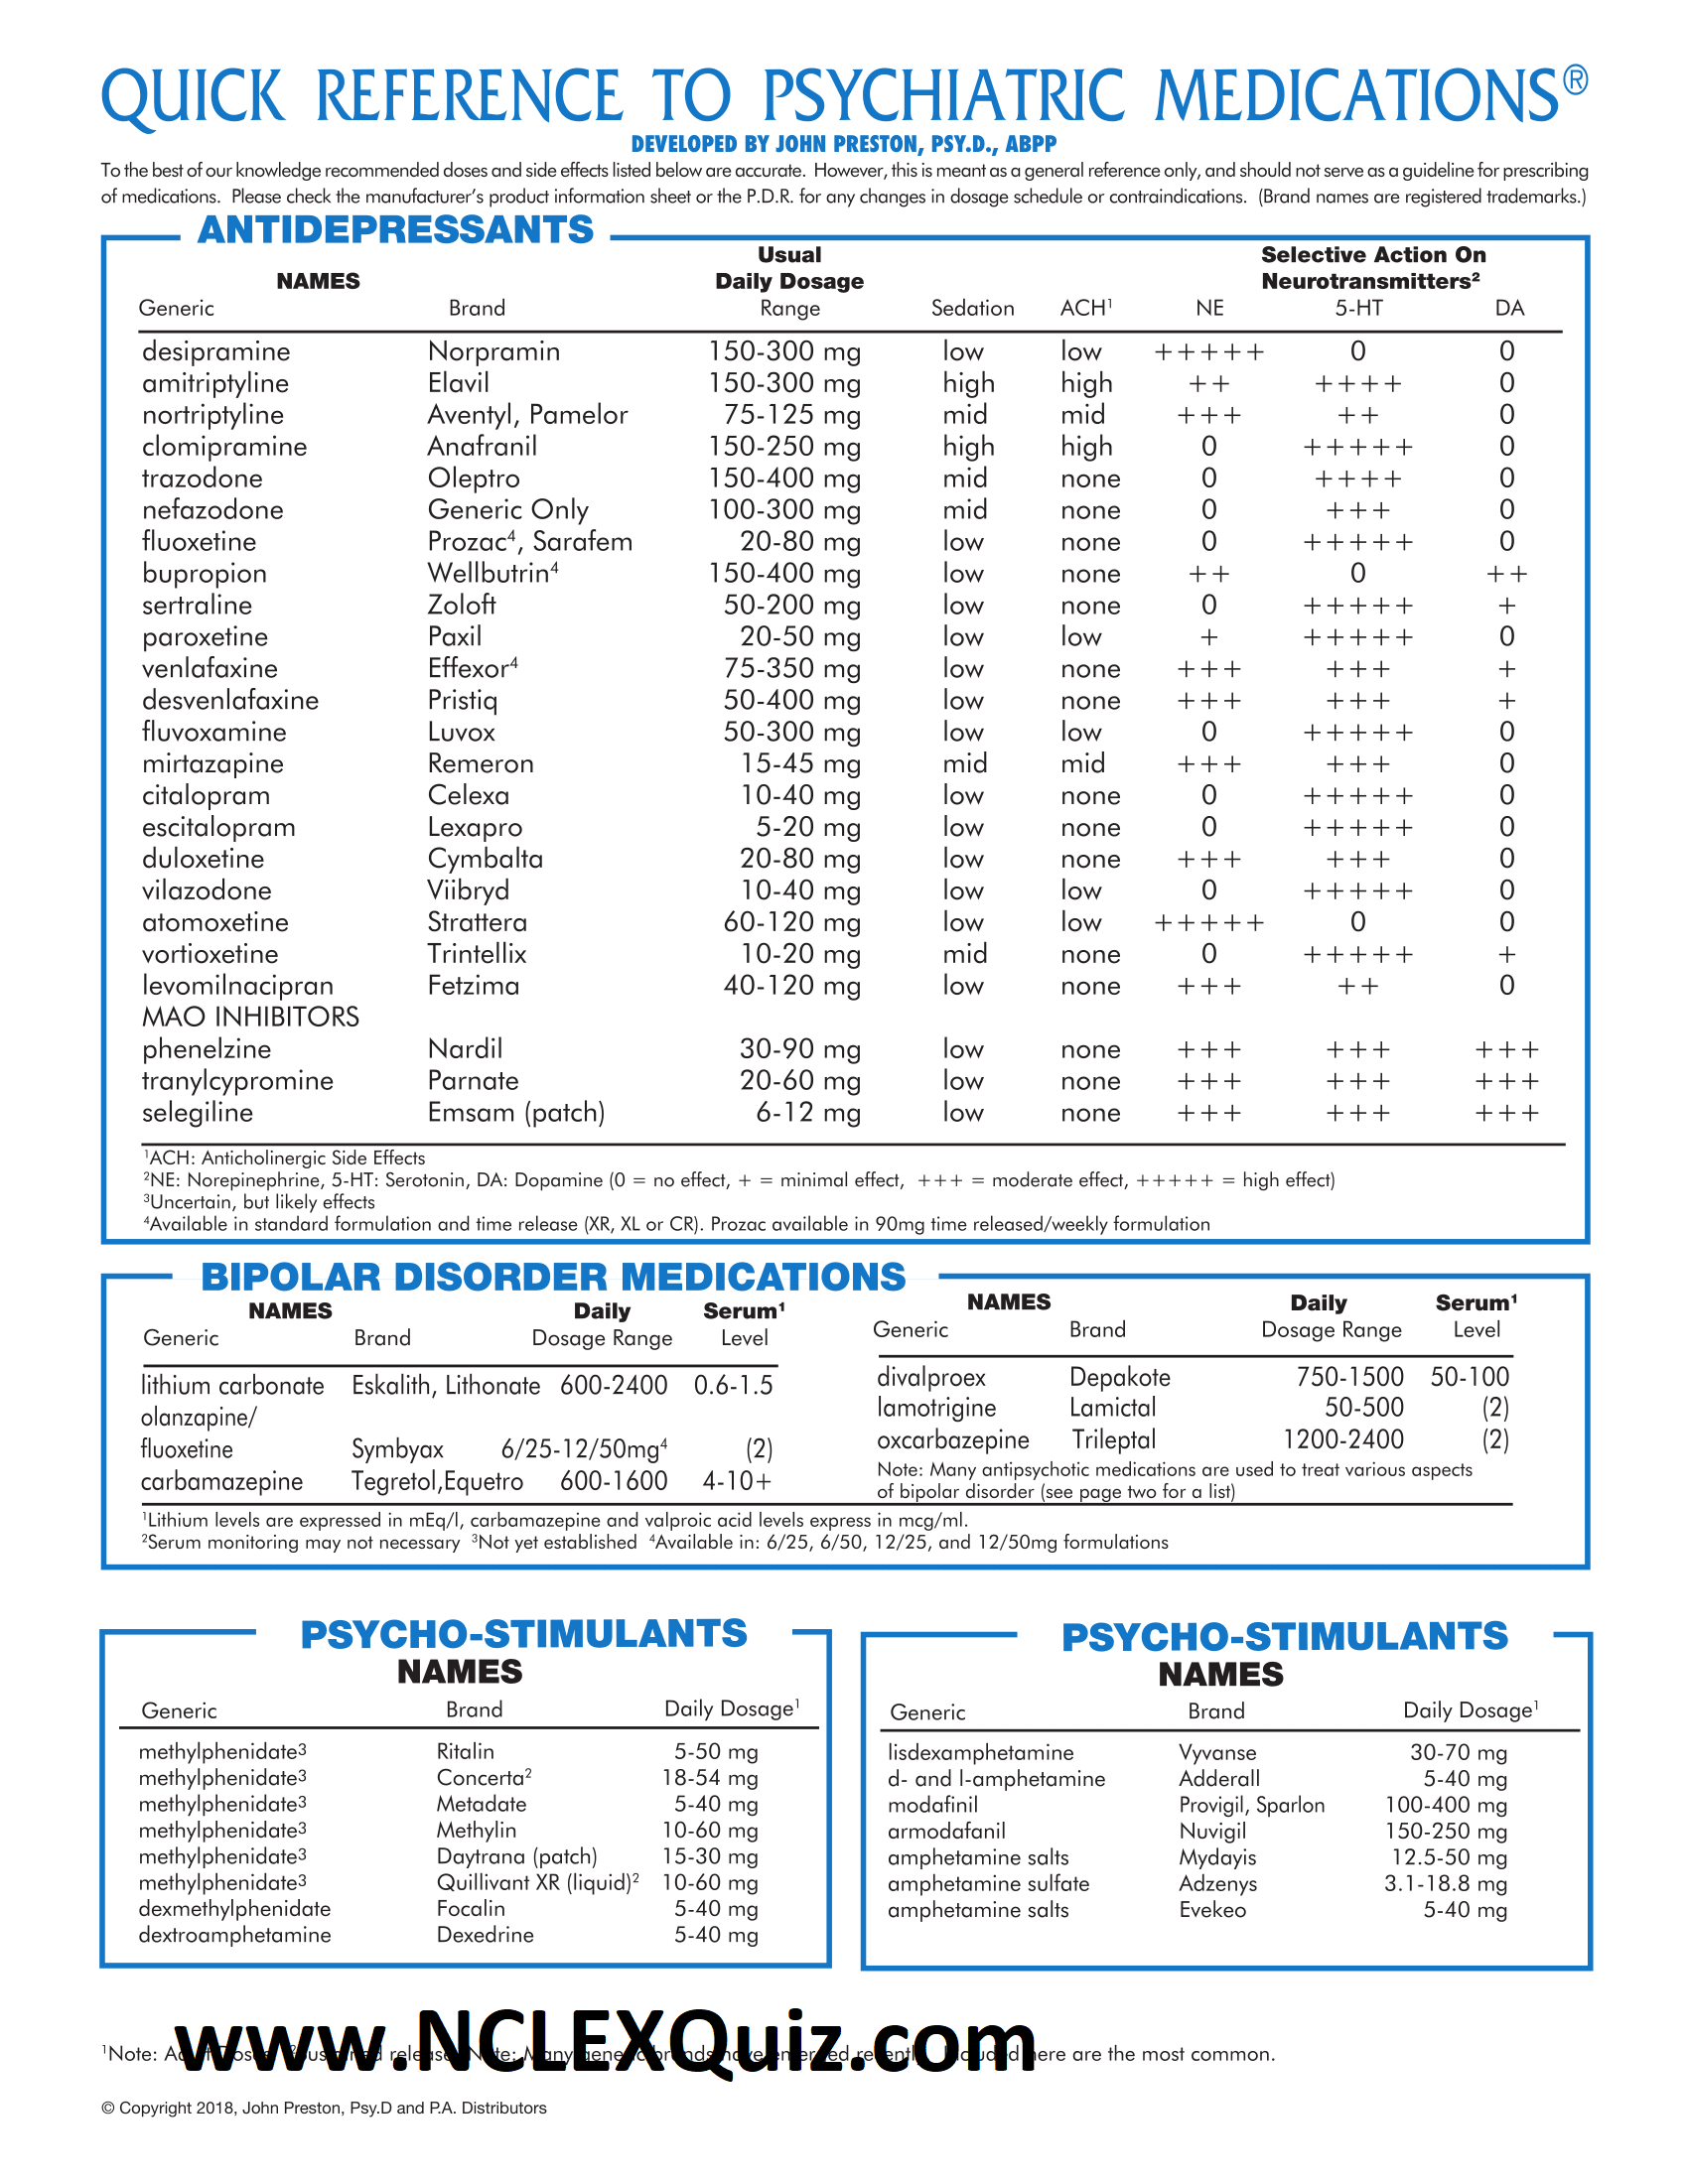 List of Psychotropic Medications 2019